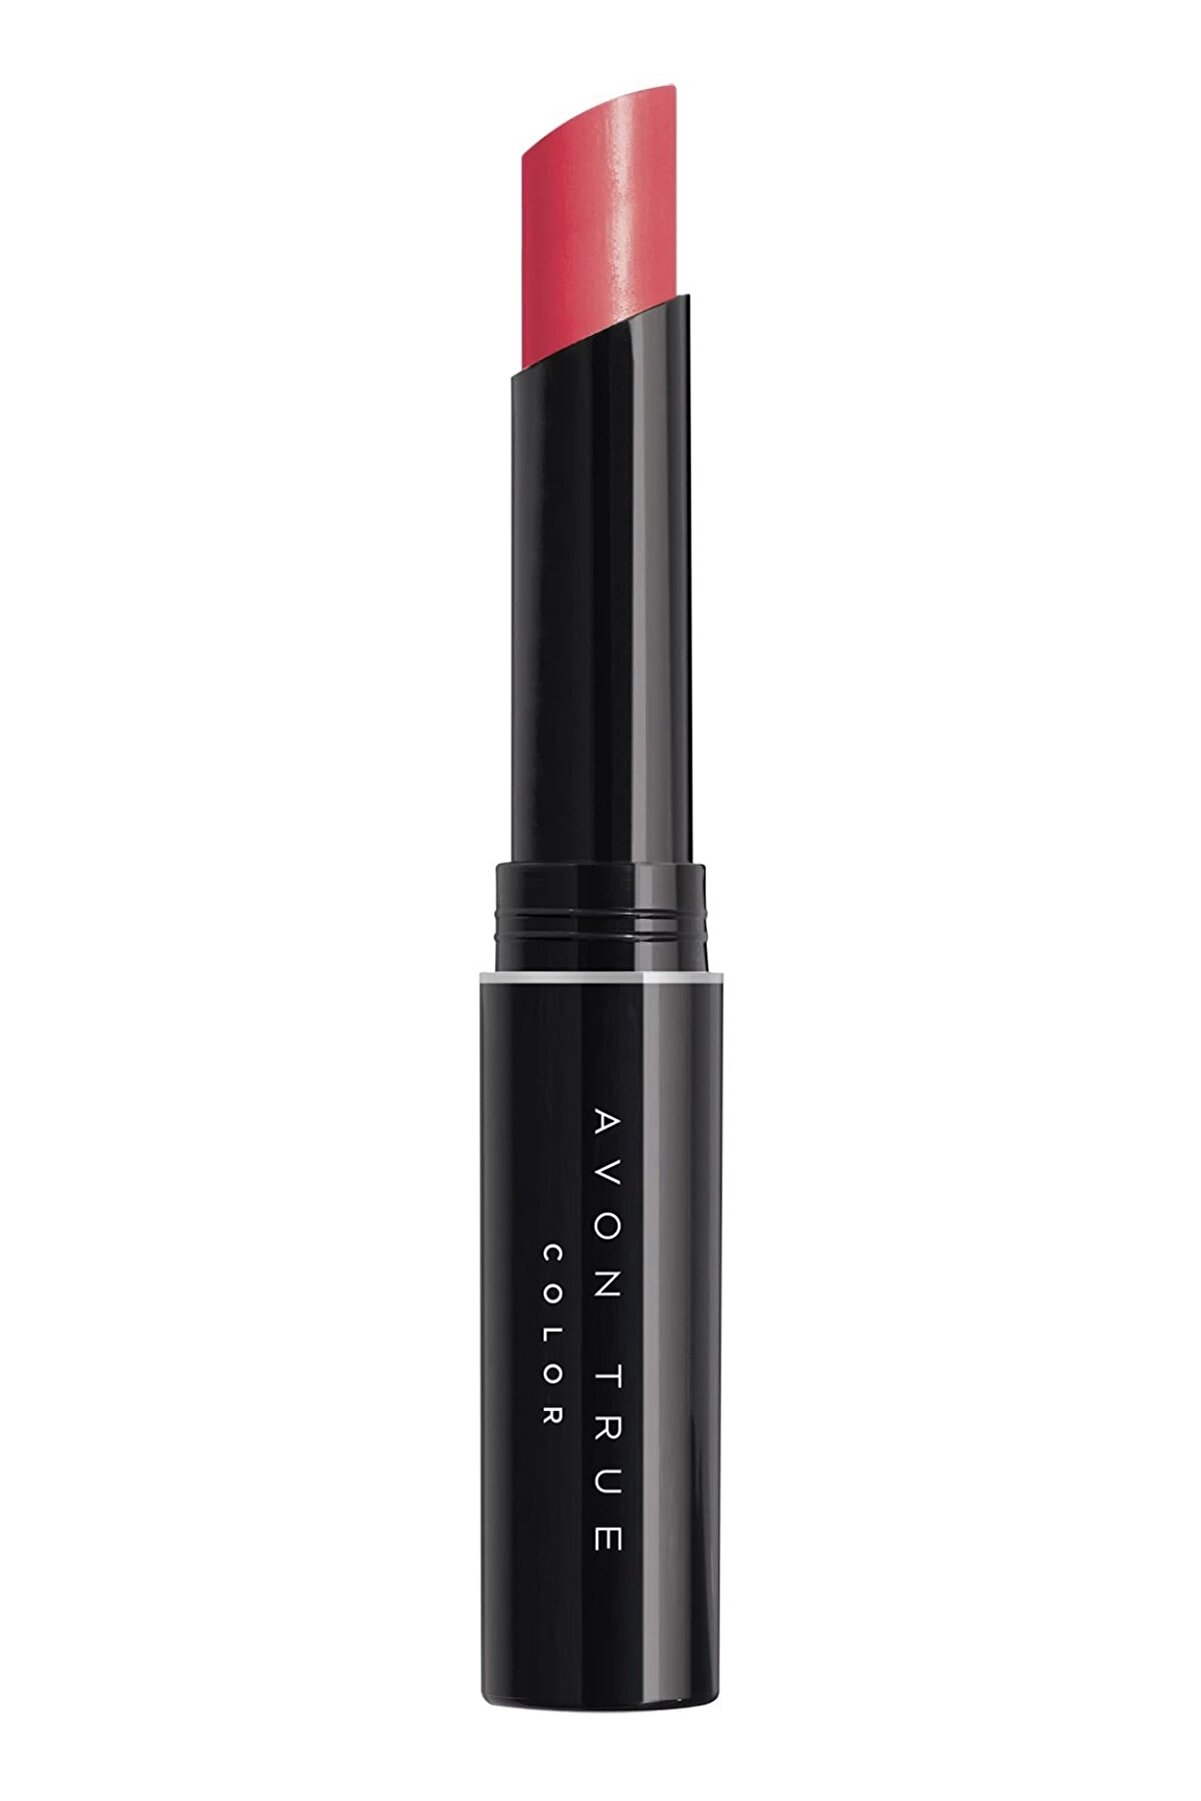 Avon Ultra Beauty Ruj Stylo Forever Pink 5050136031367